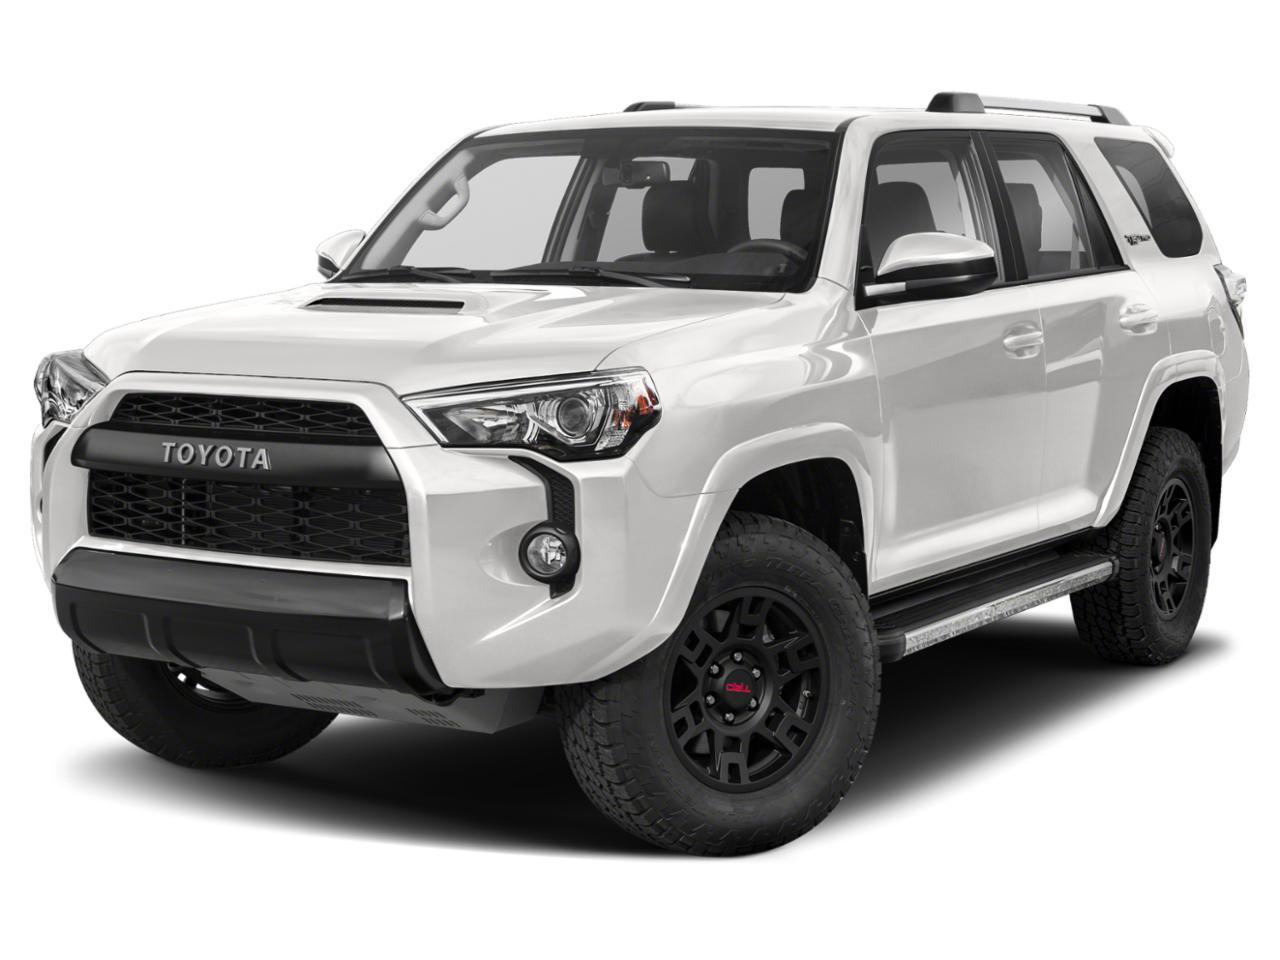 2019 Toyota 4Runner Vehicle Photo in Broussard, LA 70518